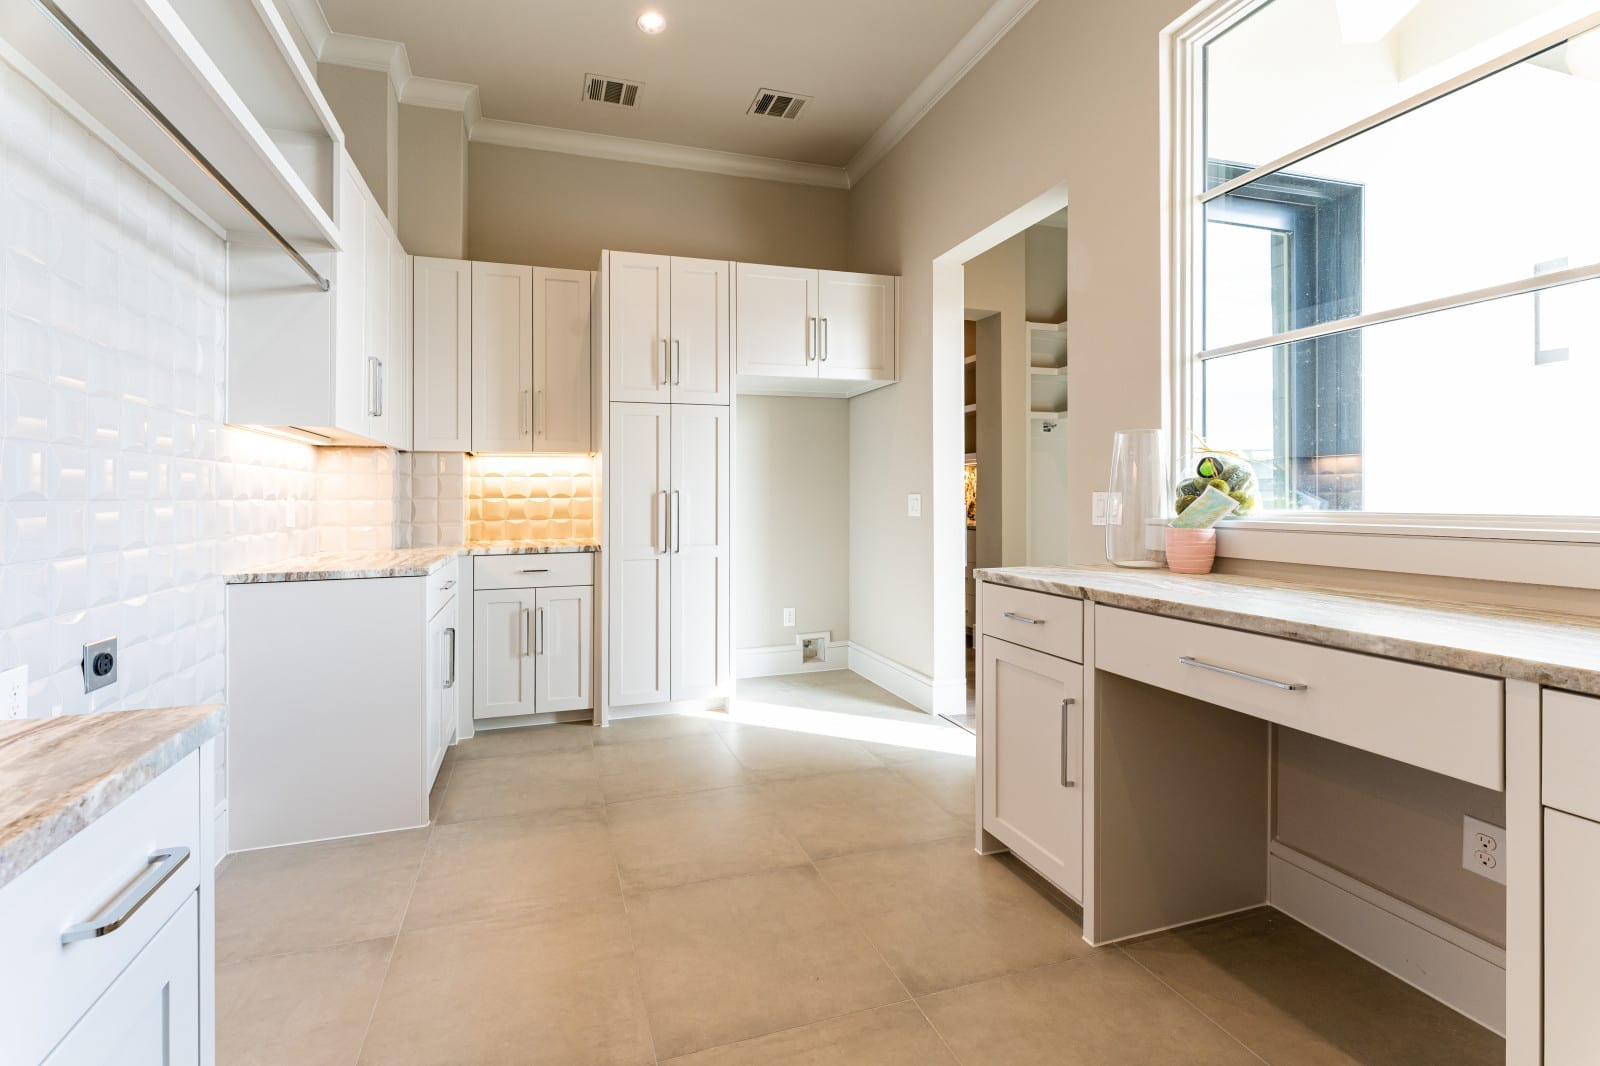 Modern Style Homes design # 17 - Millennial Design + Build